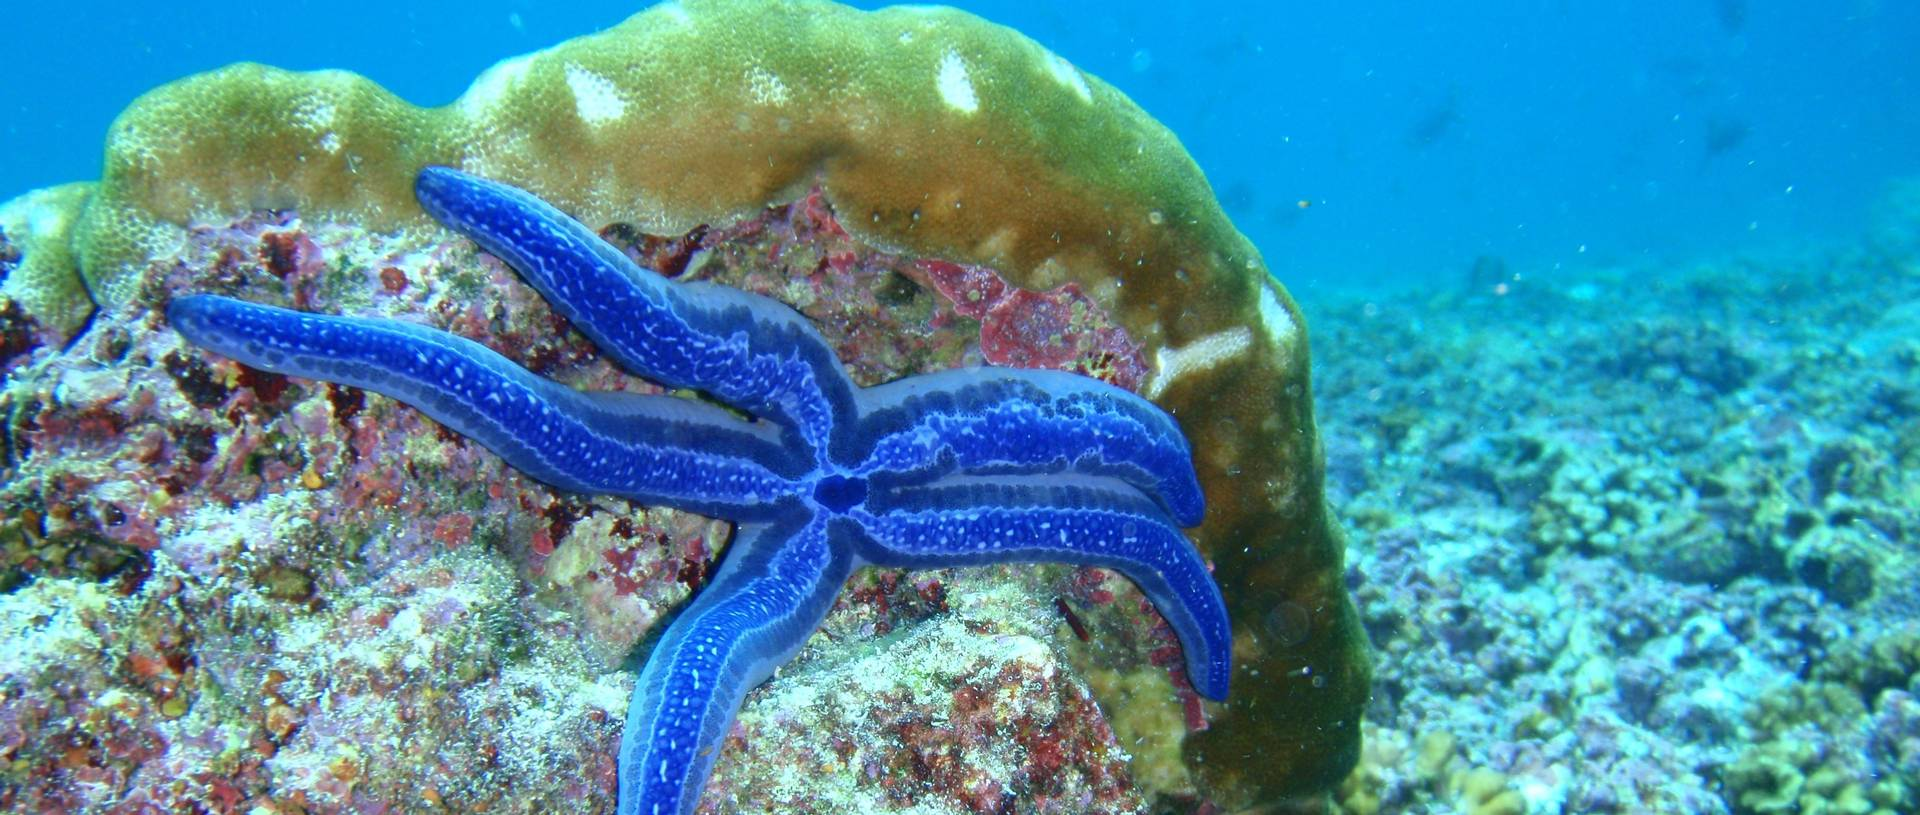 Starfish, Snorkelling, Galapagos